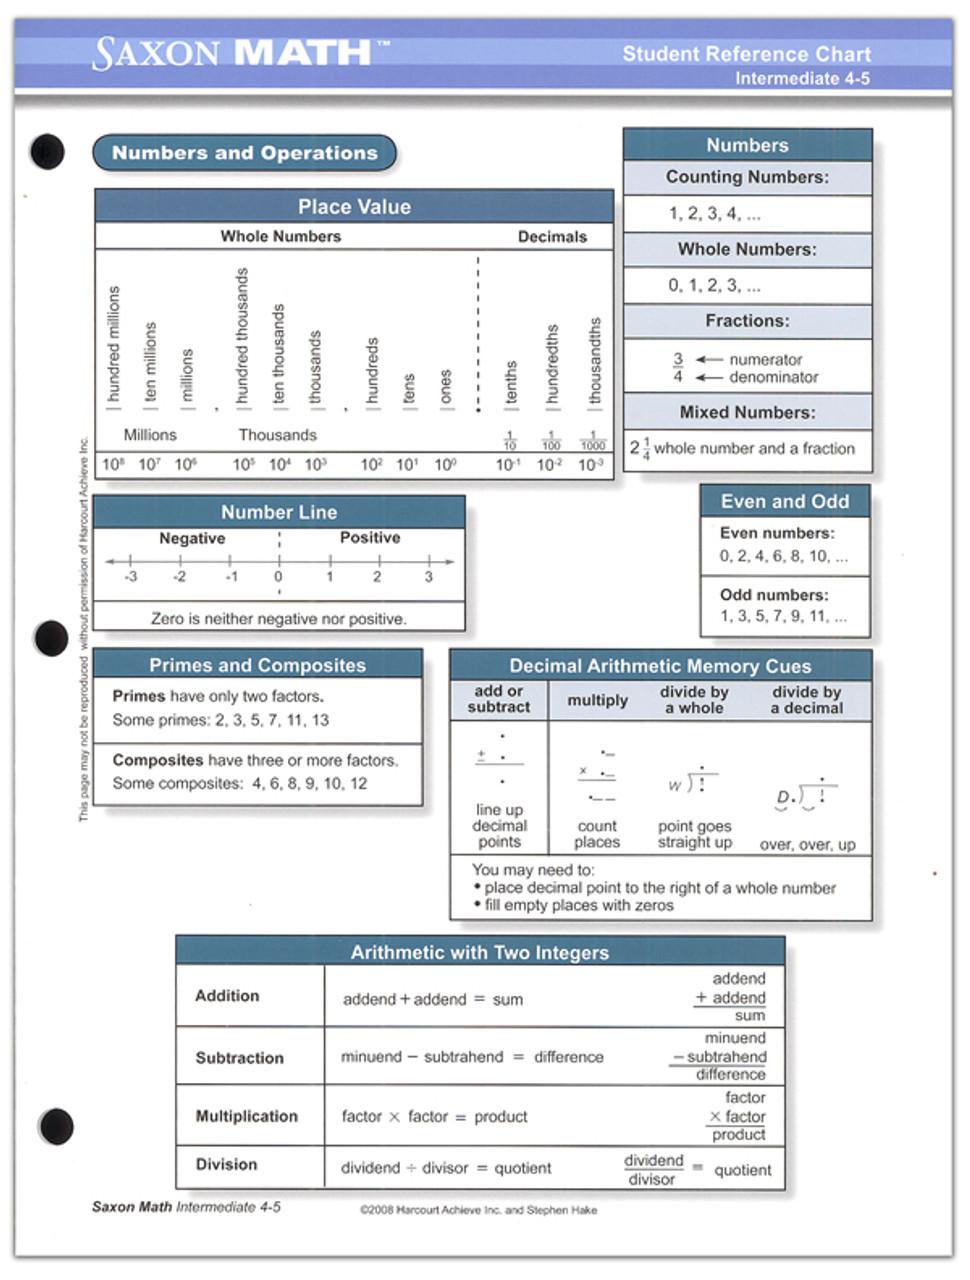 Saxon Math Grade 4-5 Intermediate Student Reference Chart - Classroom  Resource Center [ 1280 x 970 Pixel ]